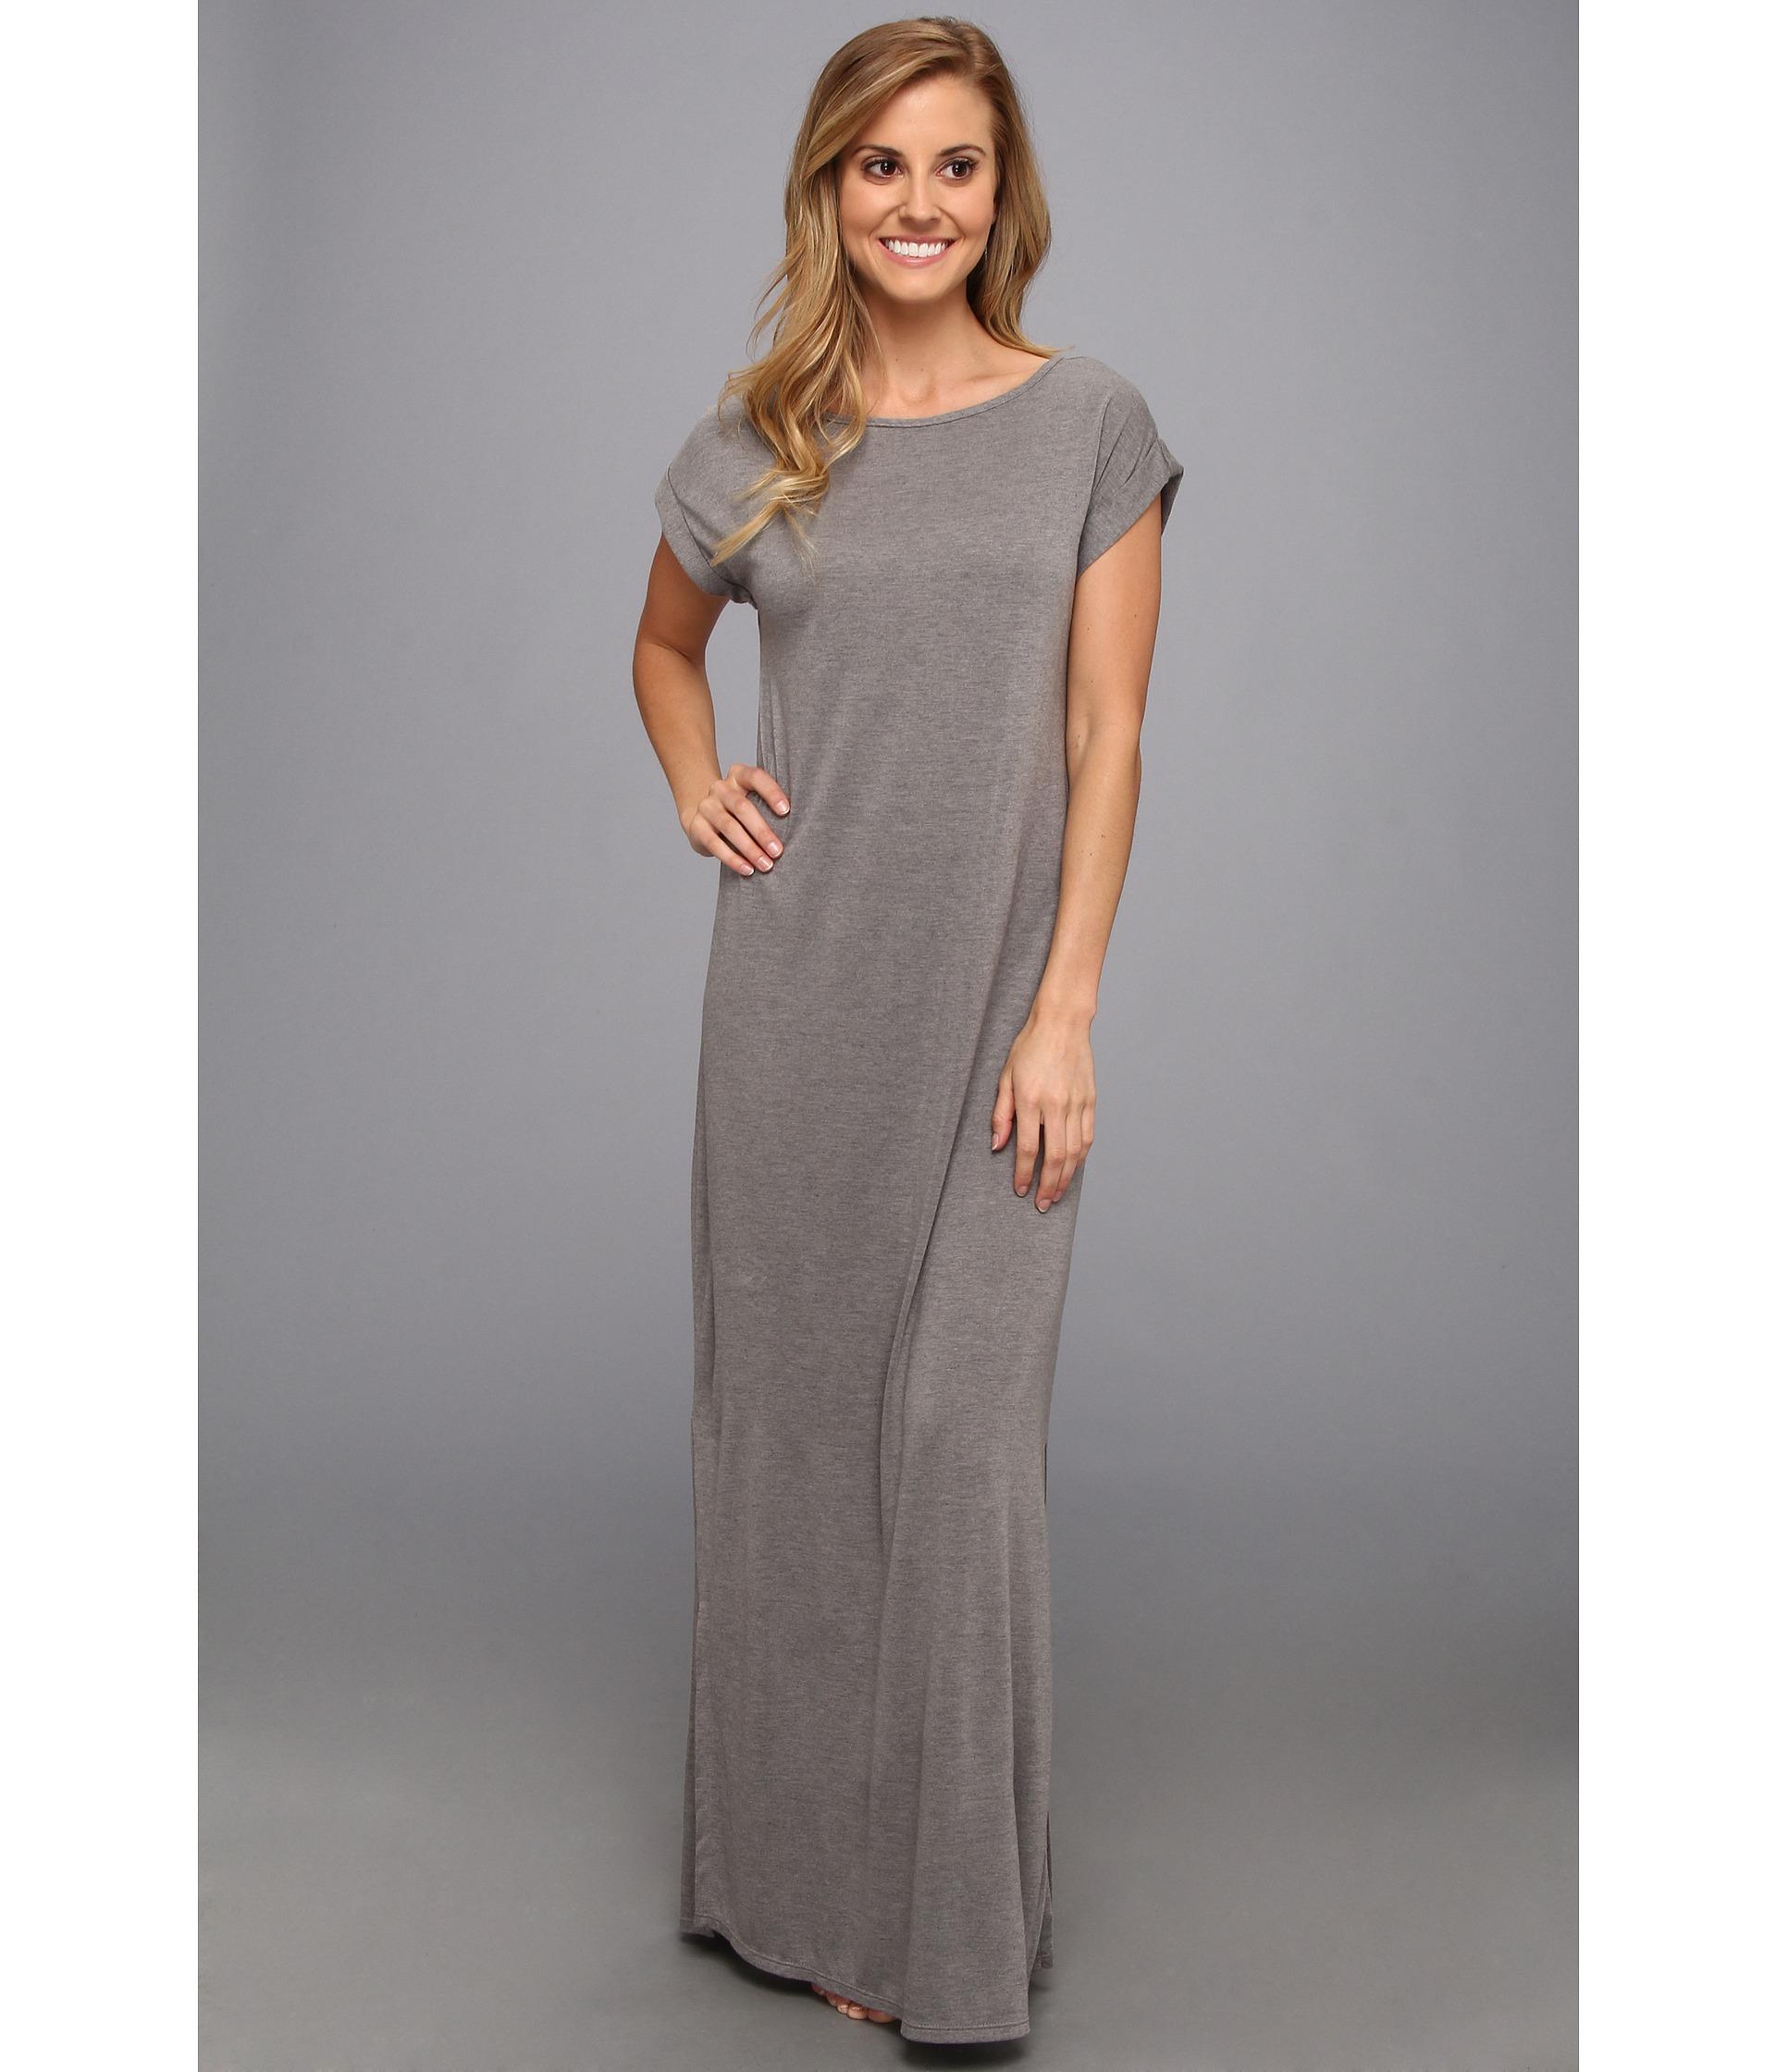 Lyst - Natori Shangrila Long Nightgown in Gray